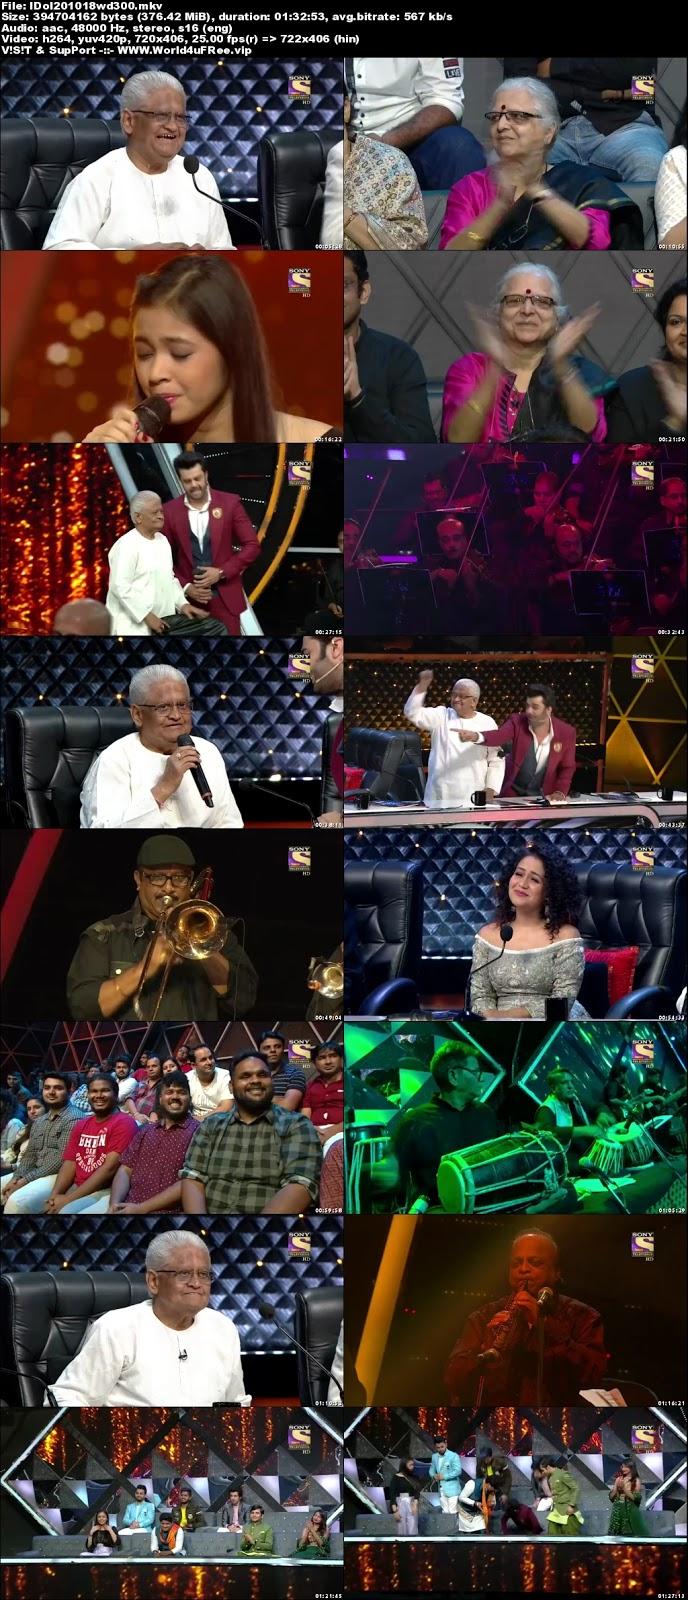 Indian Idol Season 10 20 October 2018 HDTV 480p 300Mb world4ufree.fun tv show Indian Idol Season 10 hindi tv show Indian Idol Season 10 Sony Set tv show compressed small size free download or watch online at world4ufree.fun